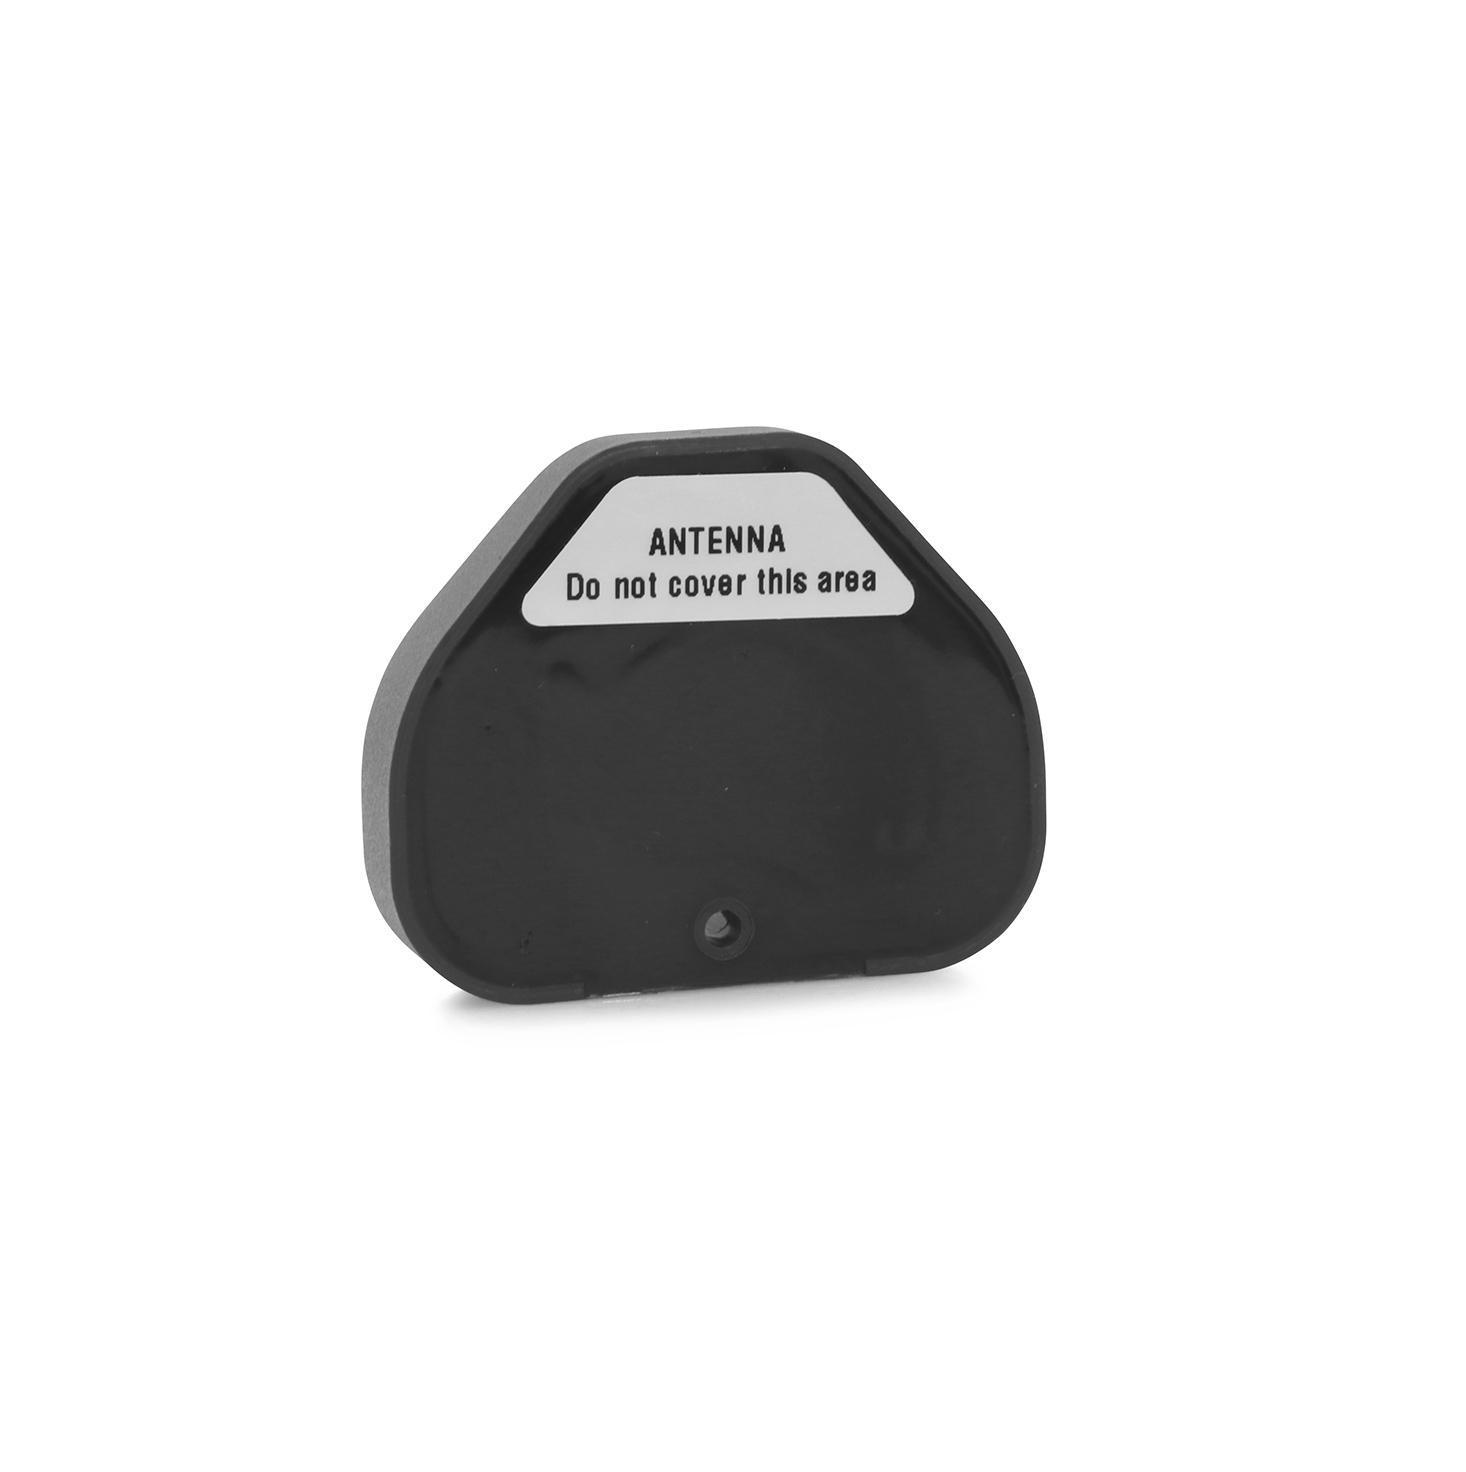 Wireless Battery Operated Vibration Sensor Iqunet Seismic